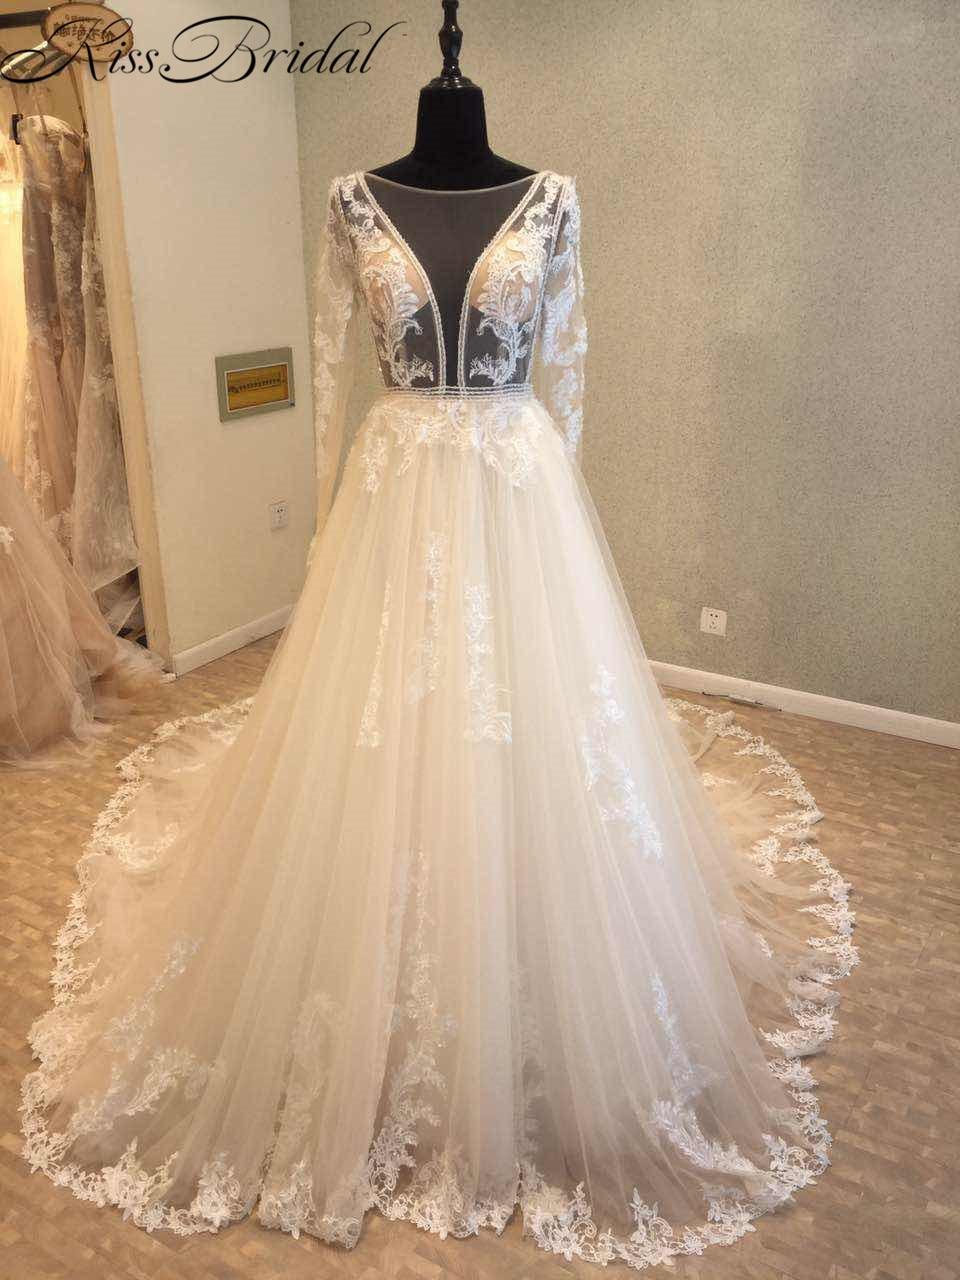 vestido de novia Modest Long Sleeve Wedding Dresses 2018 Backleess Illusion Nekcline Appliques Tulle Bride Dress